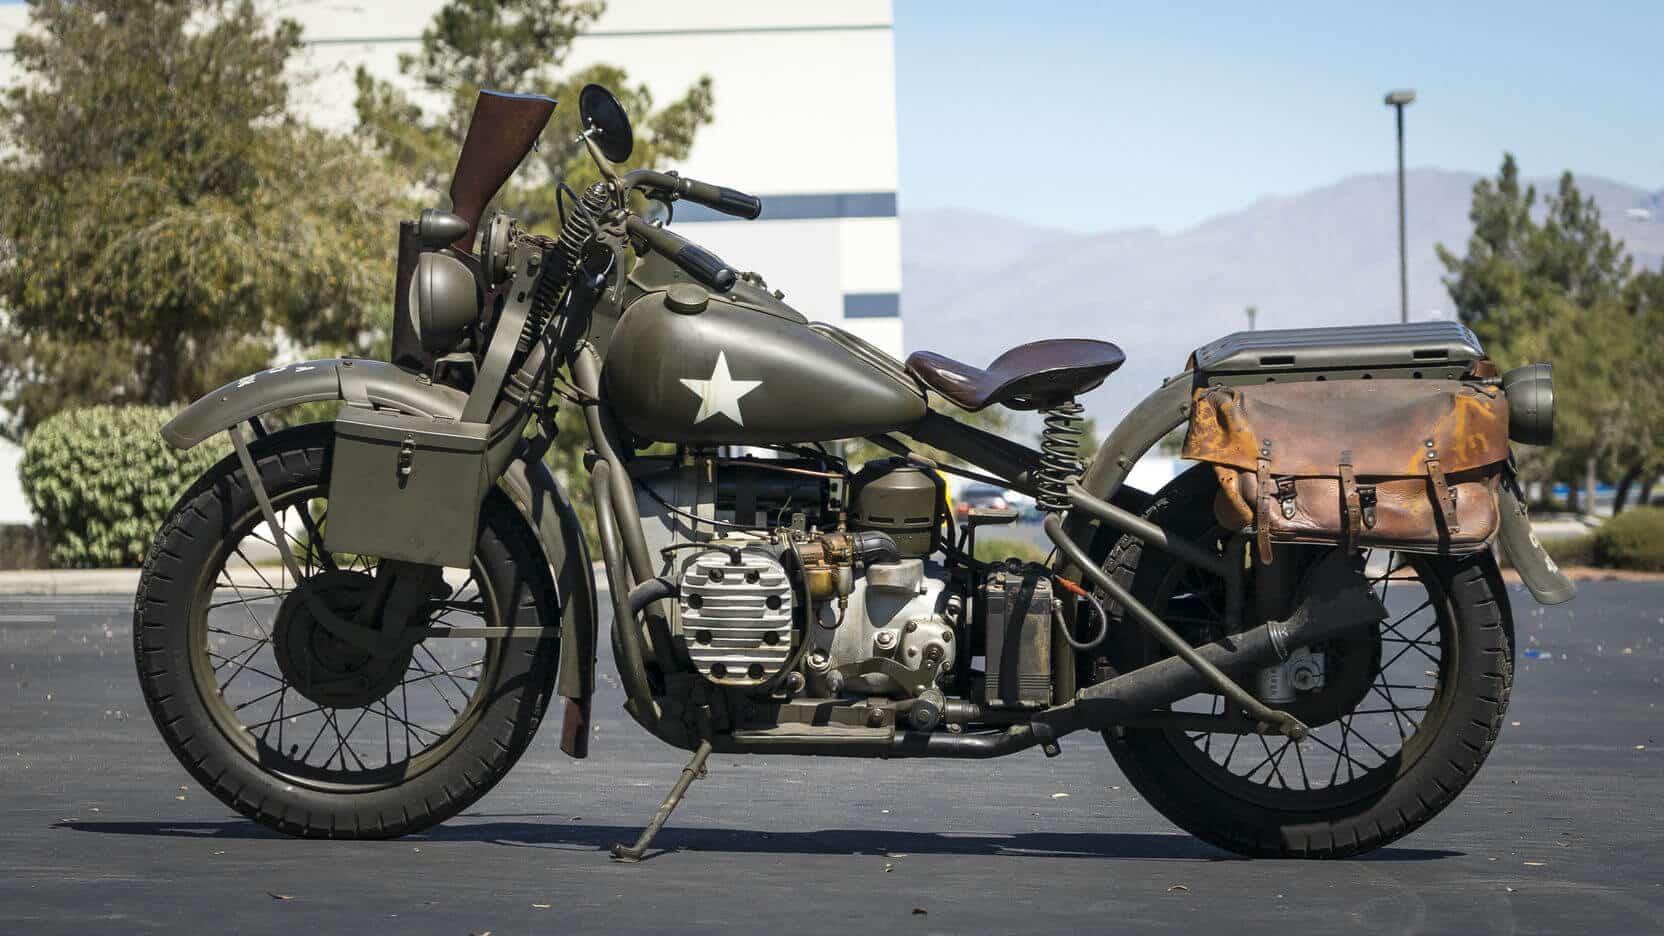 Harley-Davidson XA. Amerykański bokser